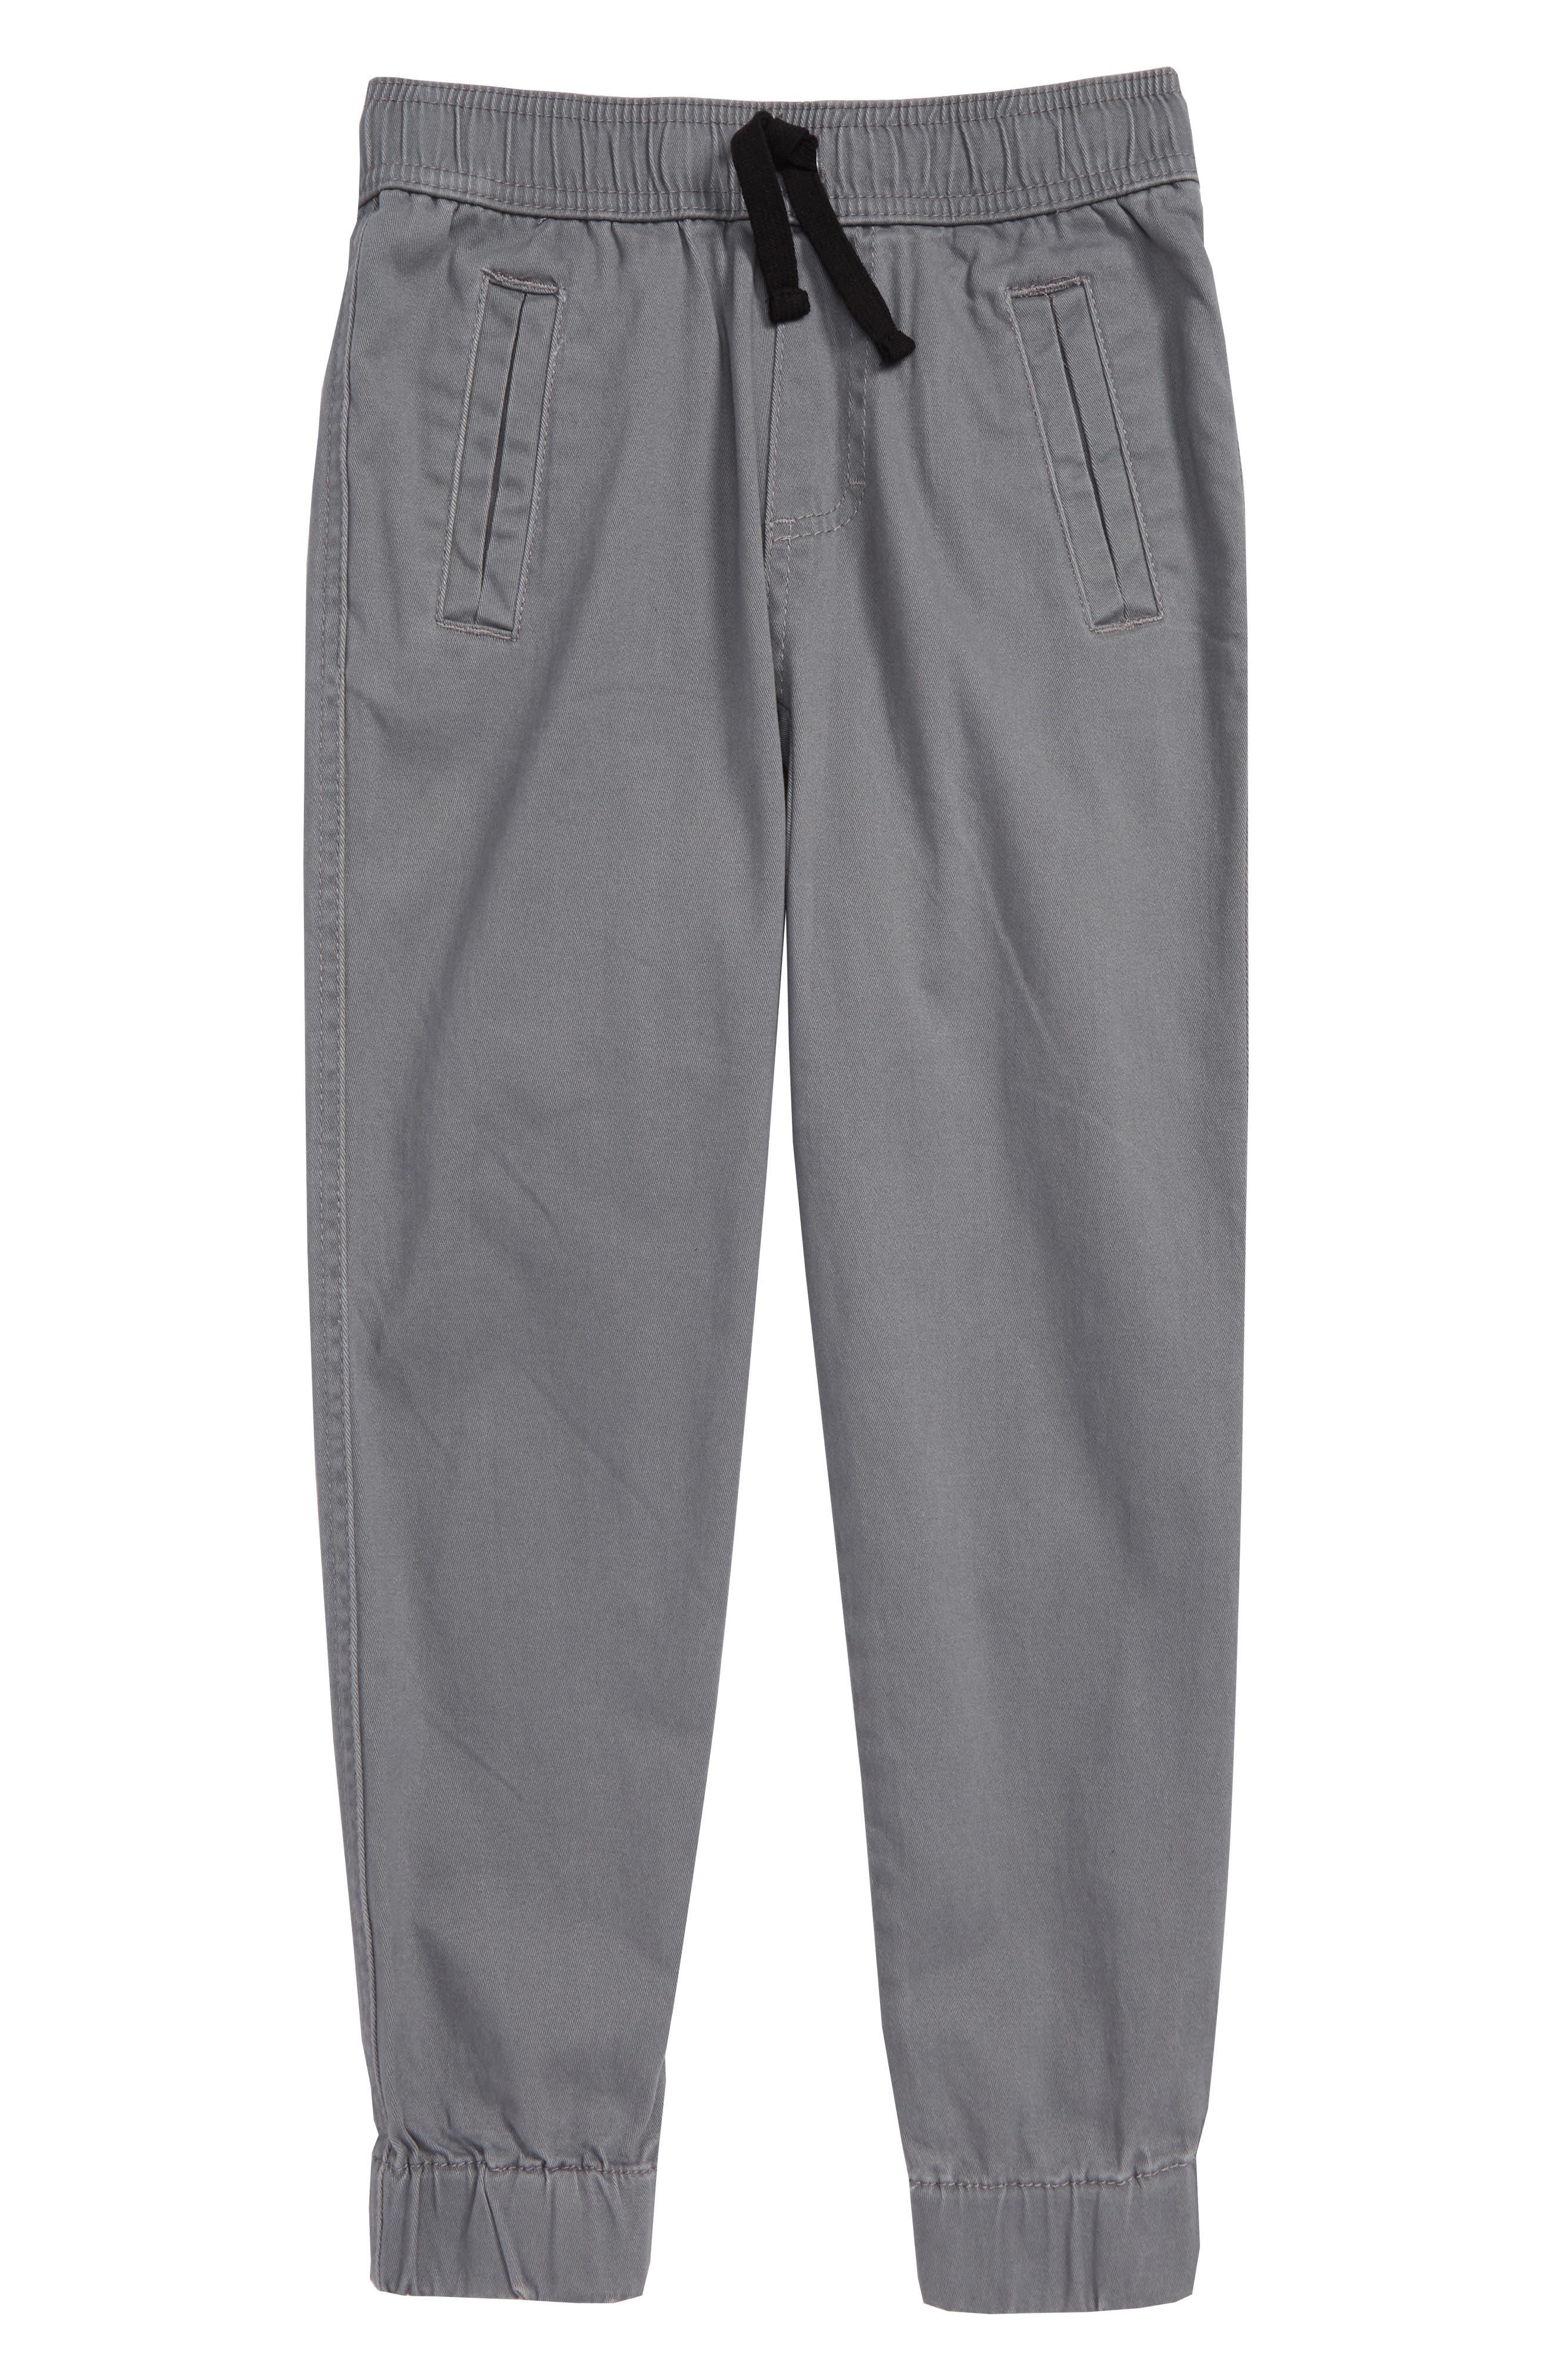 Woven Jogger Pants,                             Main thumbnail 1, color,                             021